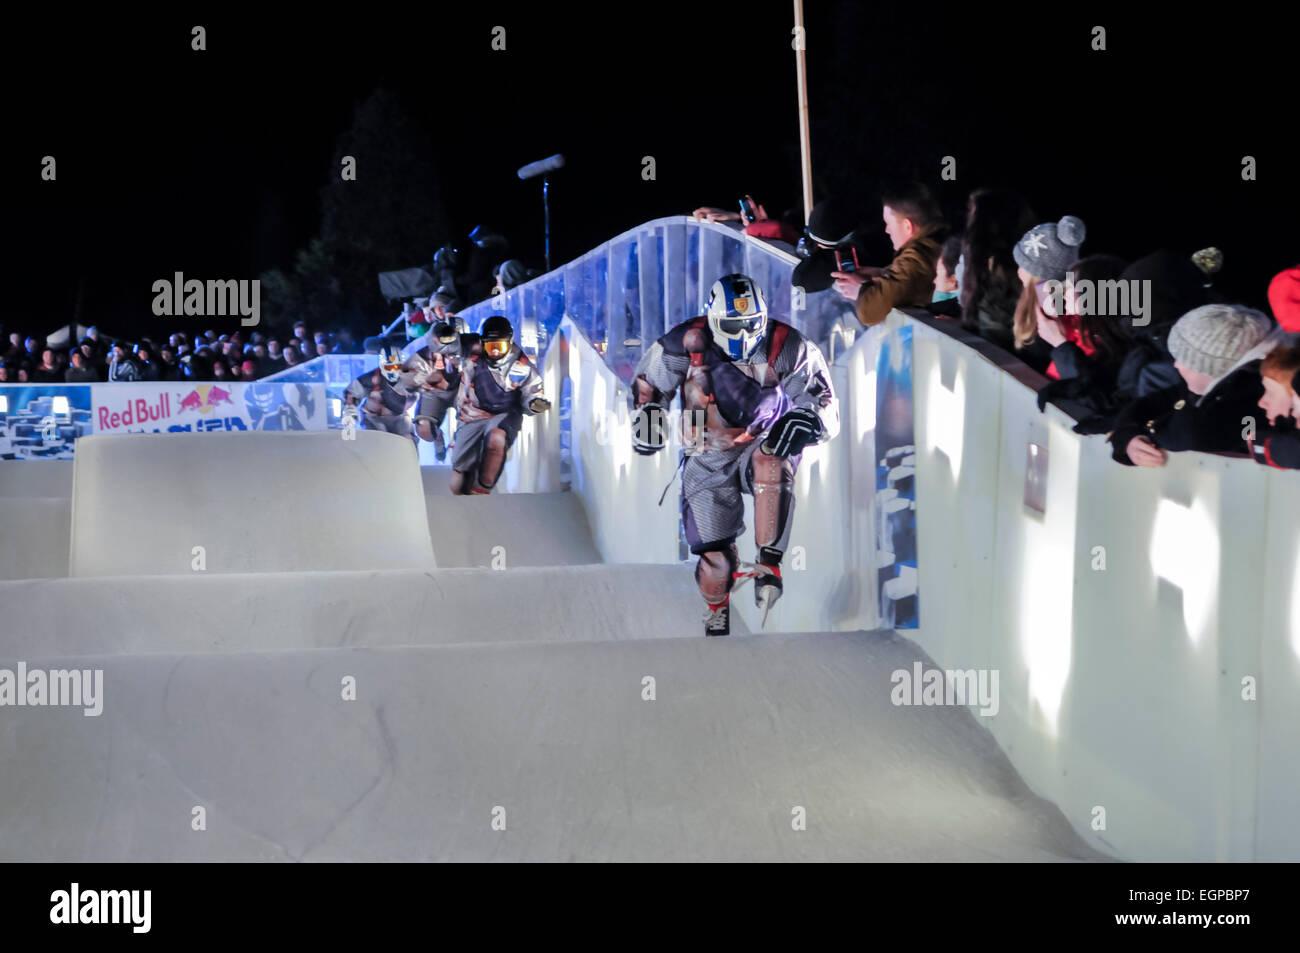 Ice Skating Track Stock Photos & Ice Skating Track Stock